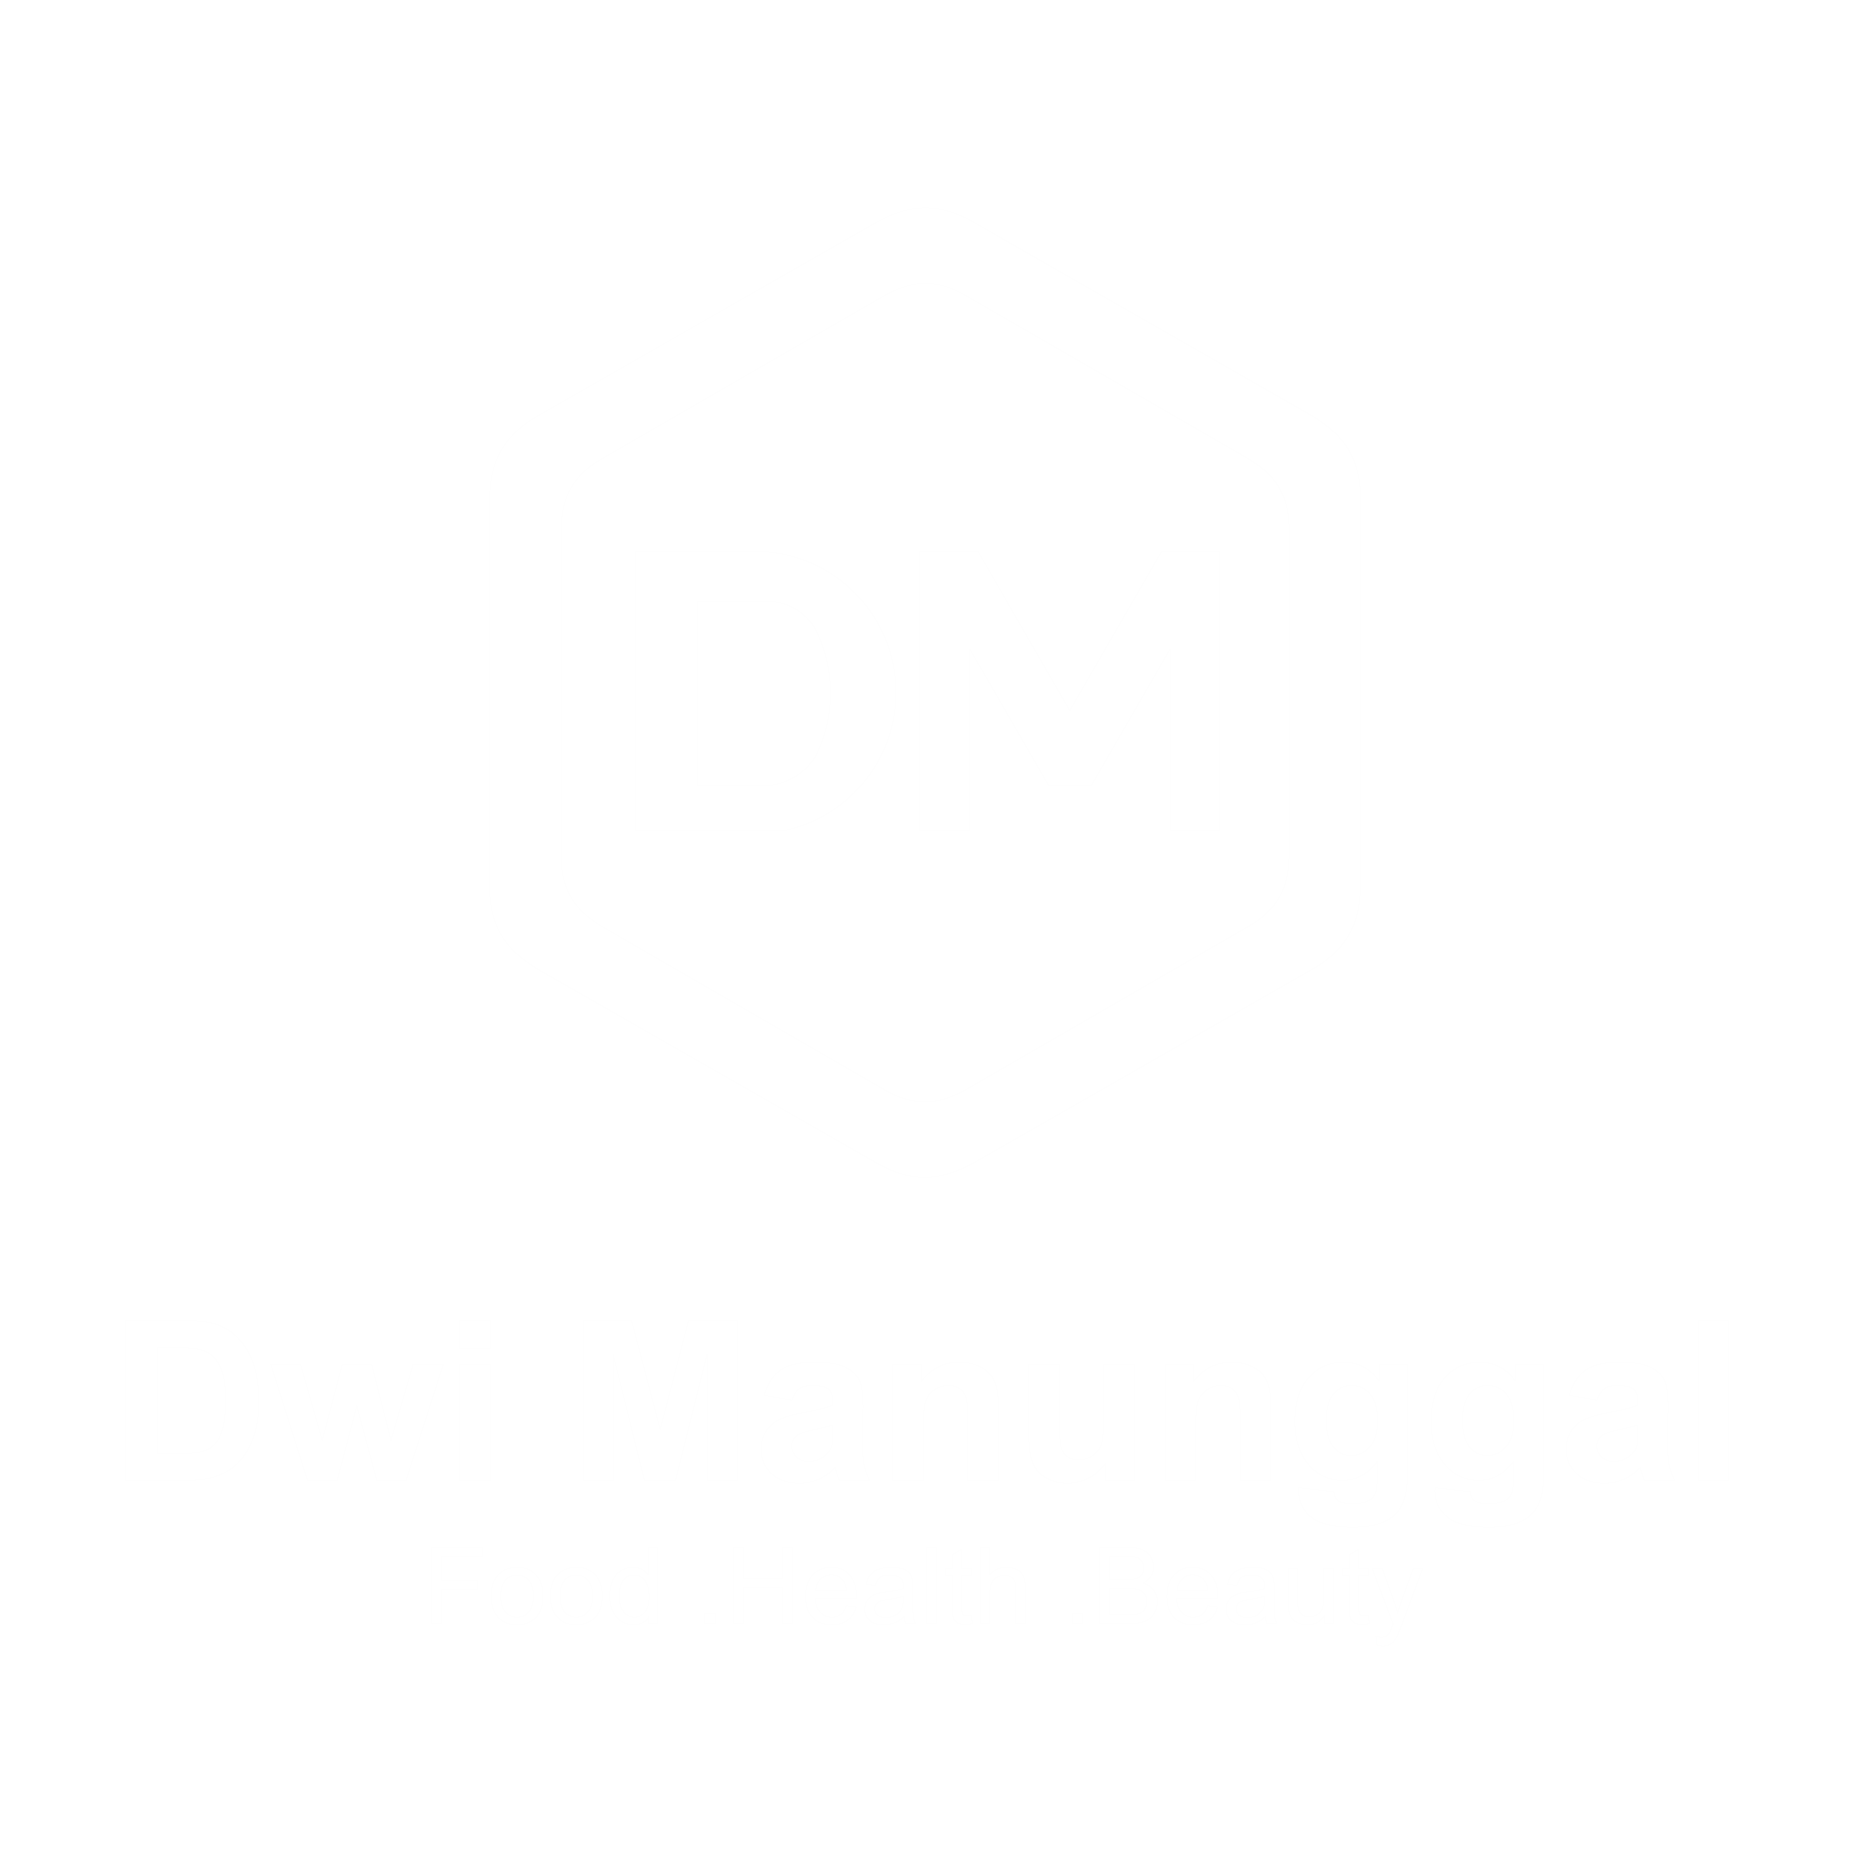 LOGO DWI MANUNGGAL PUTIH